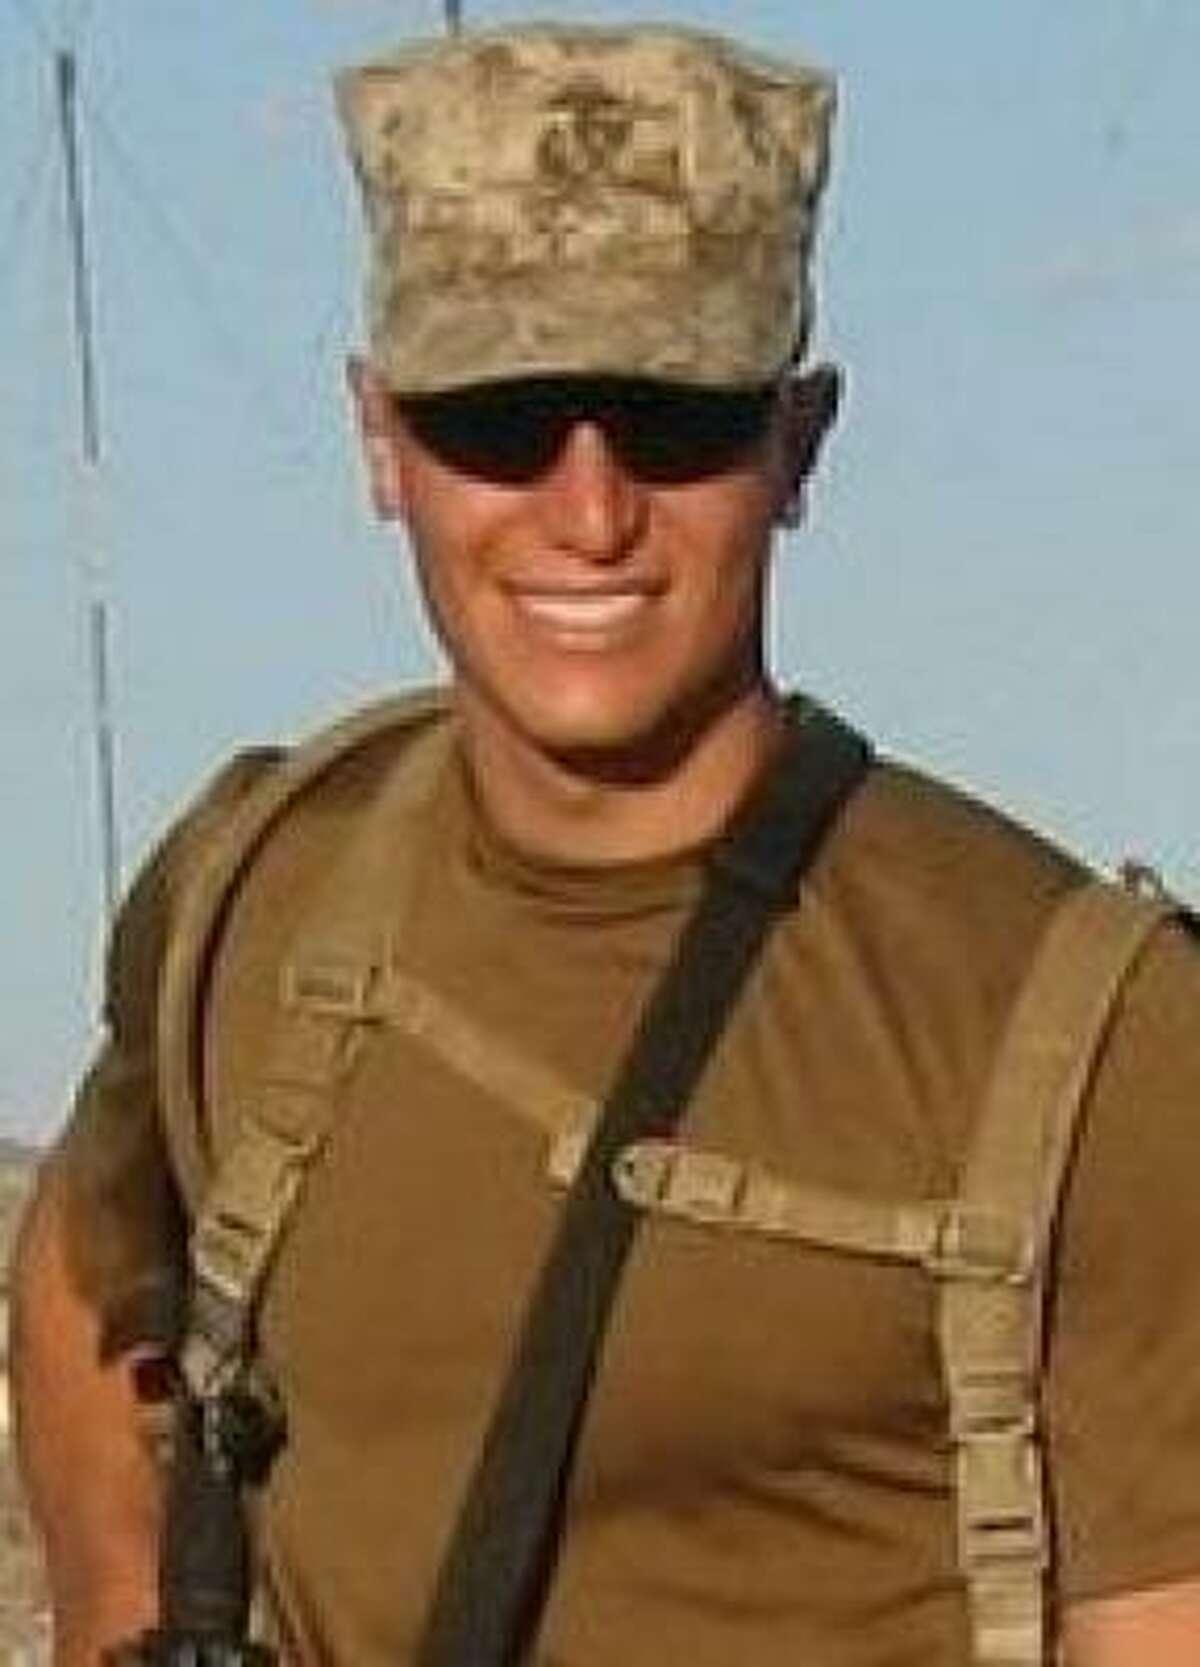 Marine Lt.Nathan Krissoff, 25, was killed last year in a bomb explosion.